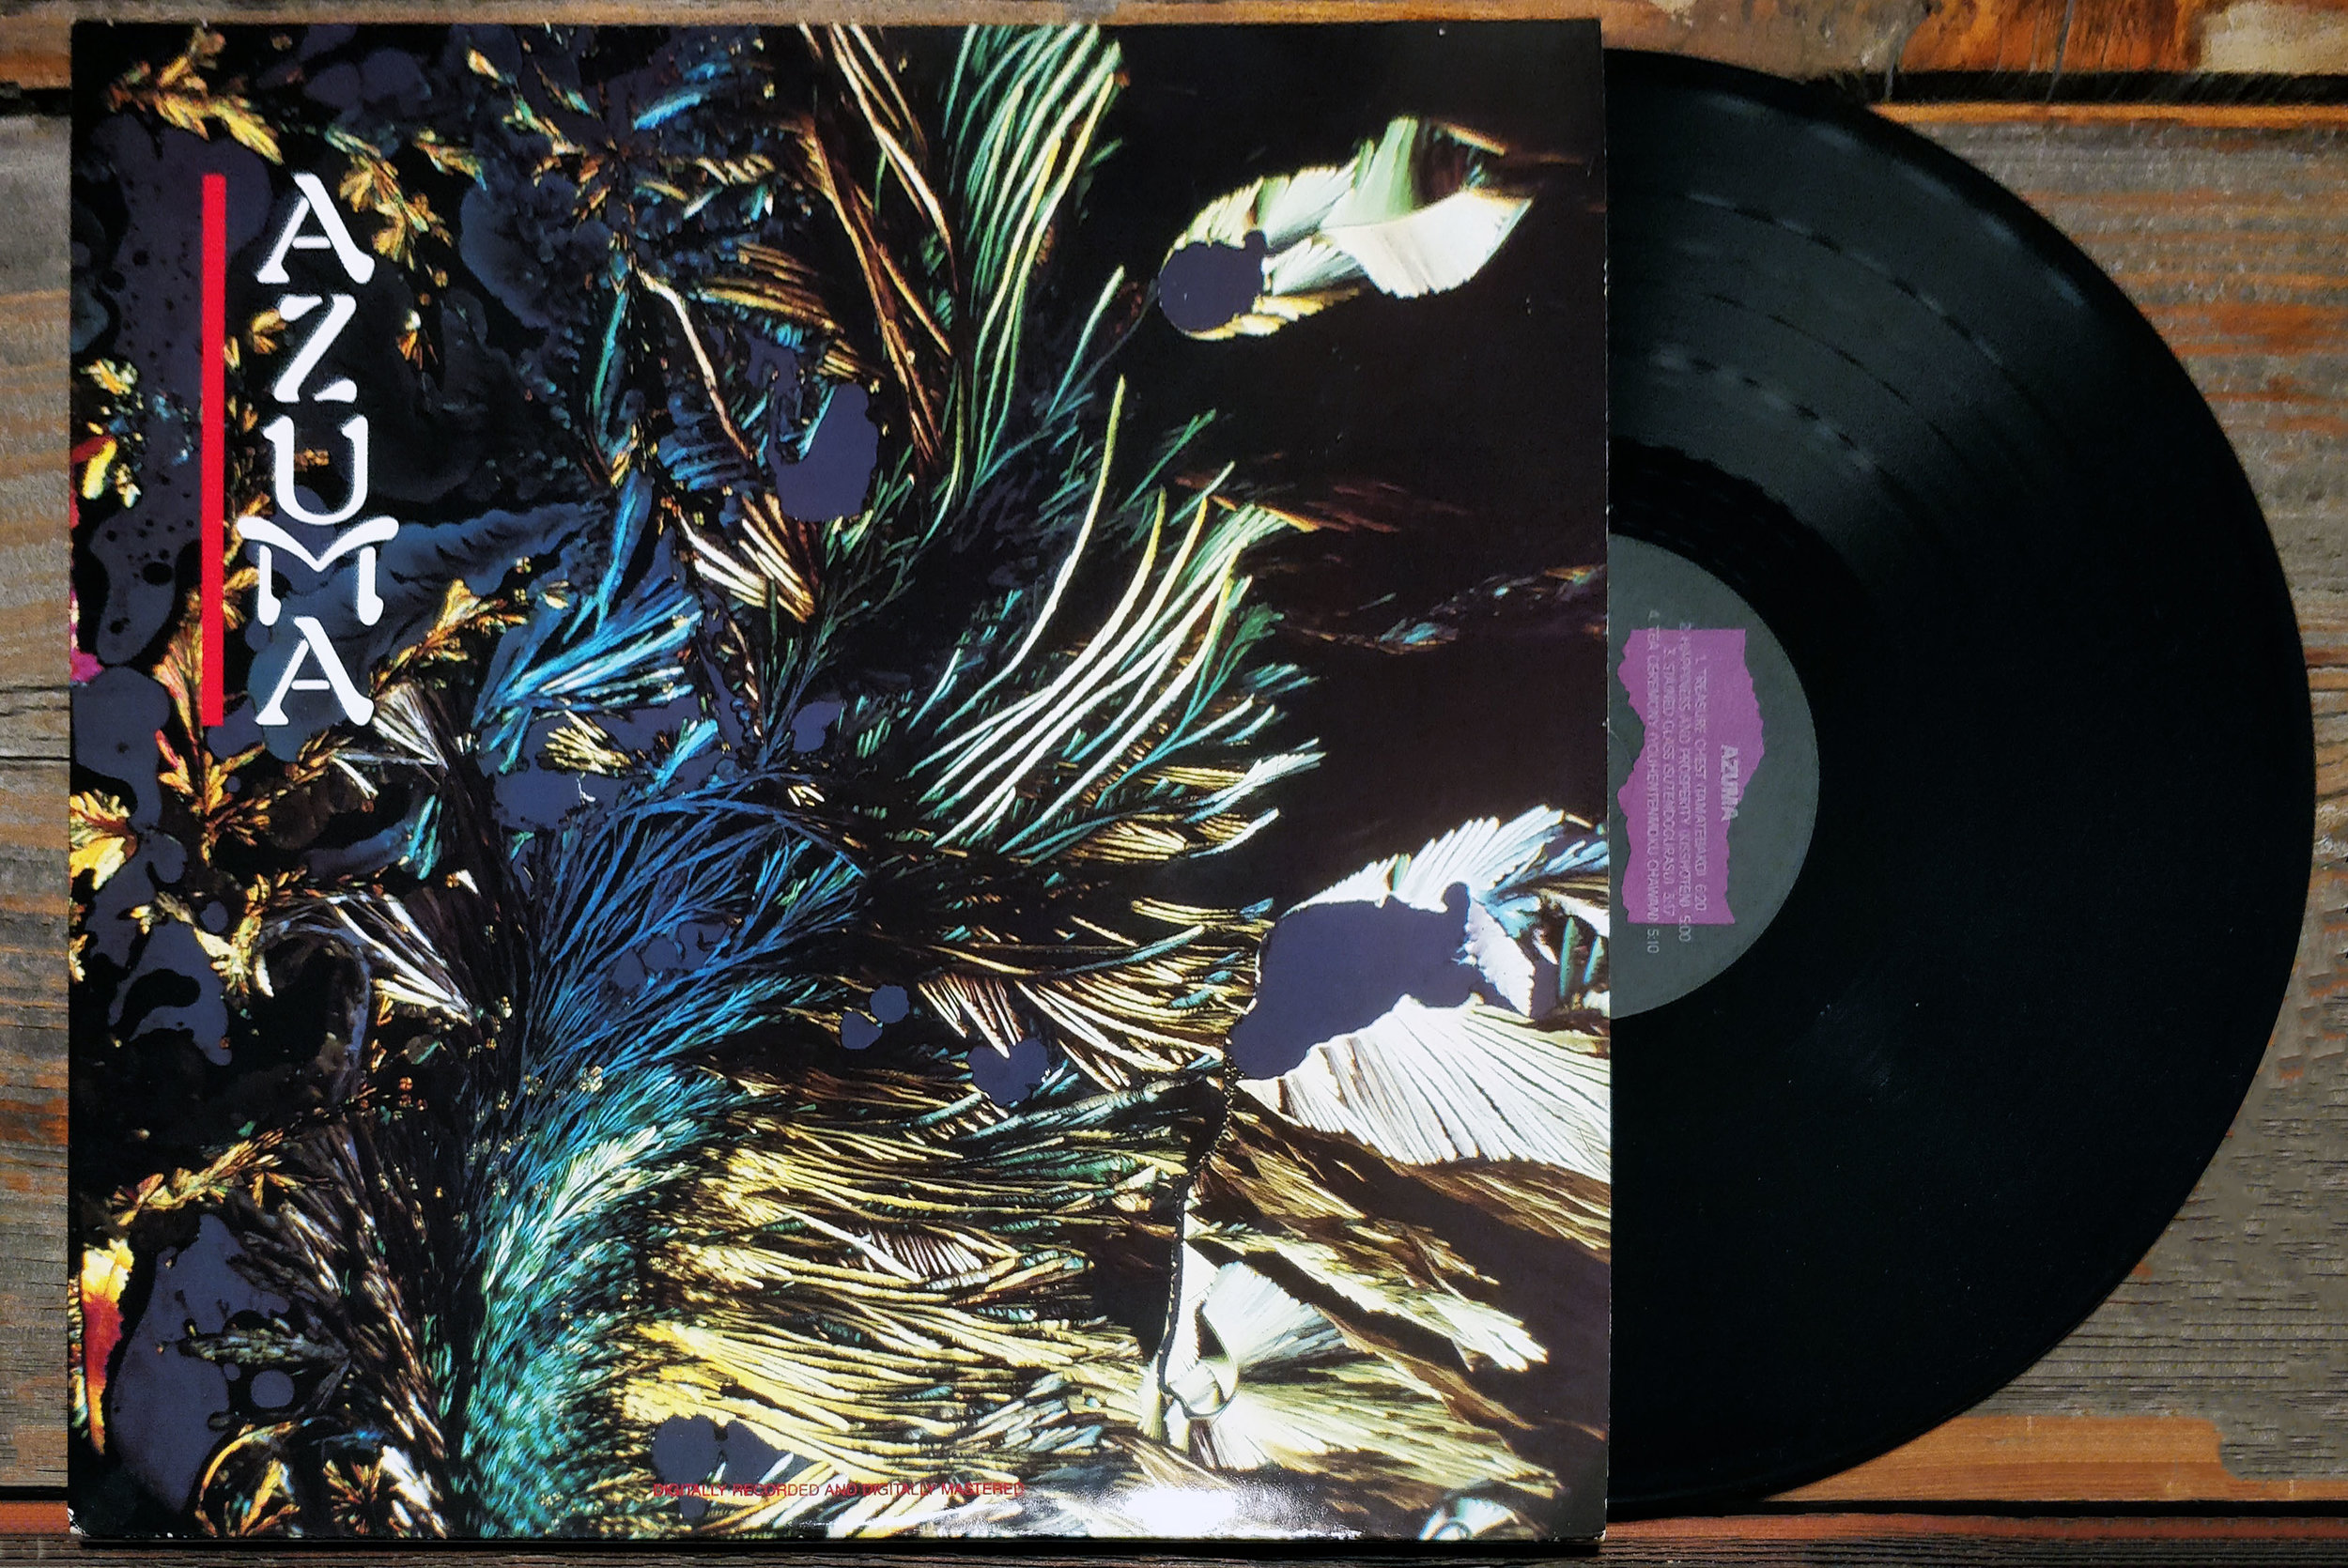 AZUMA by Yoshitaka Azuma pressed on black vinyl by Private Music